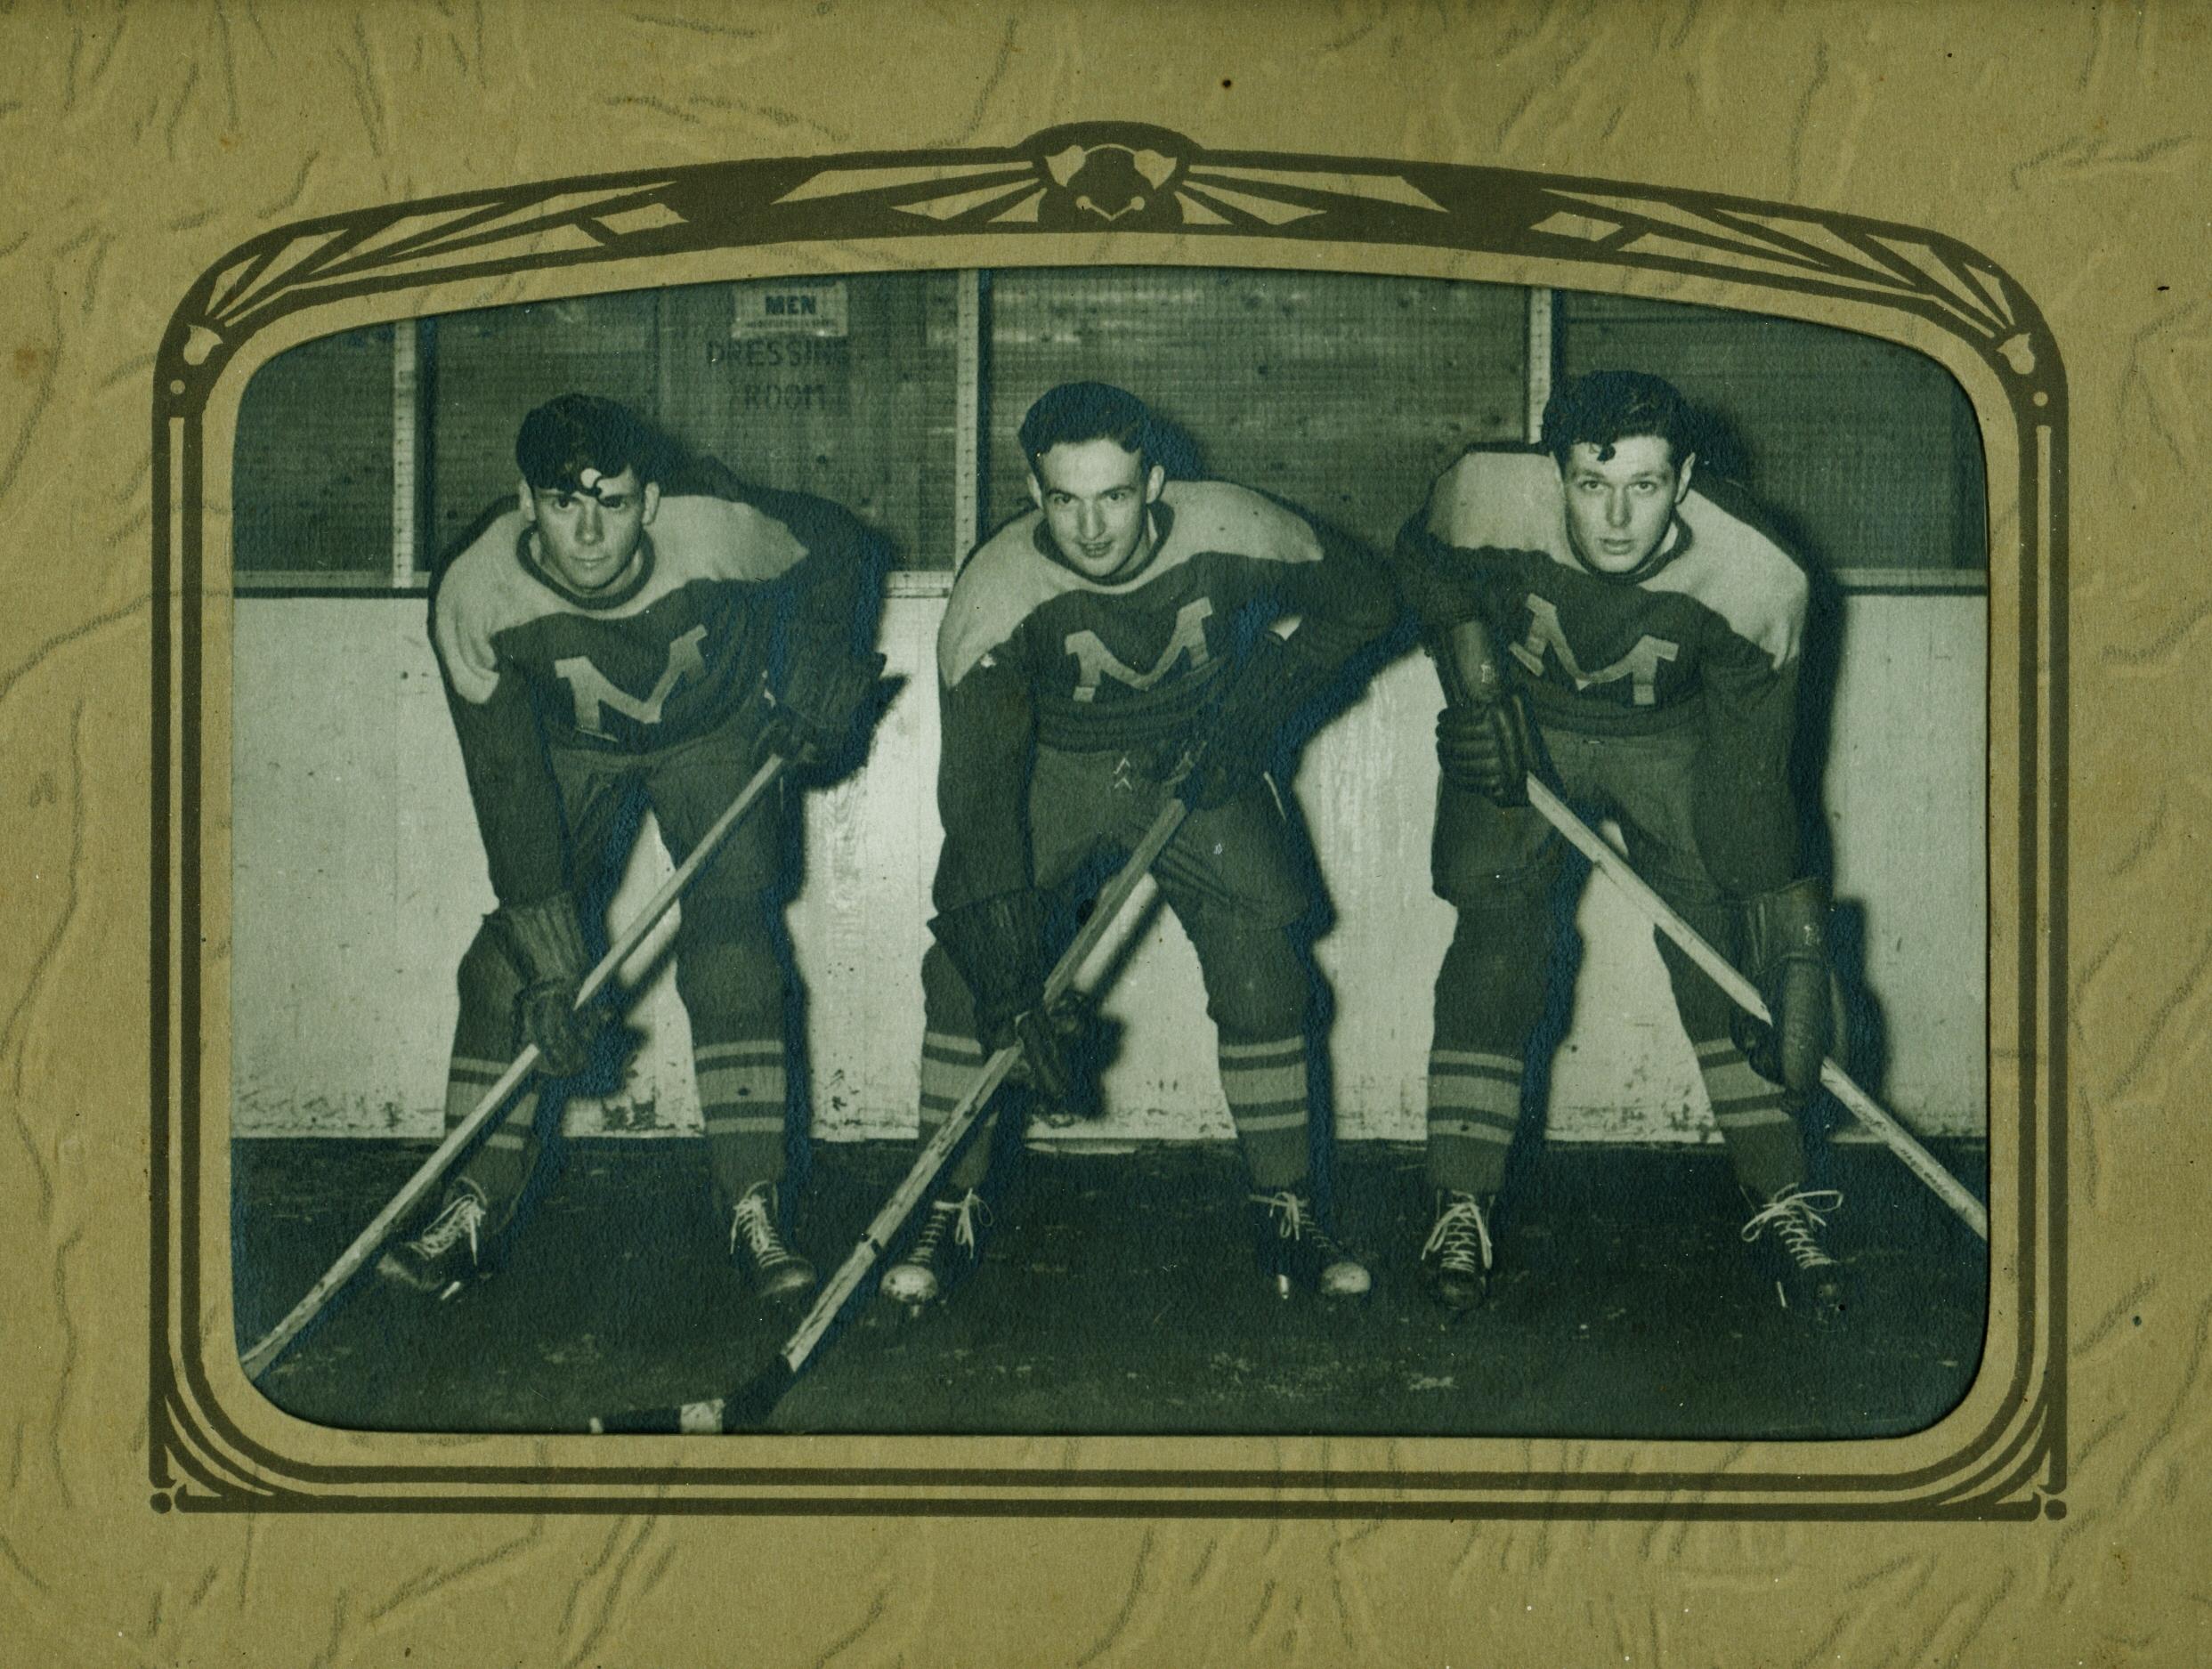 Men's Hockey, Ernie Trumble, Ray Goodchild, Eric McInroy